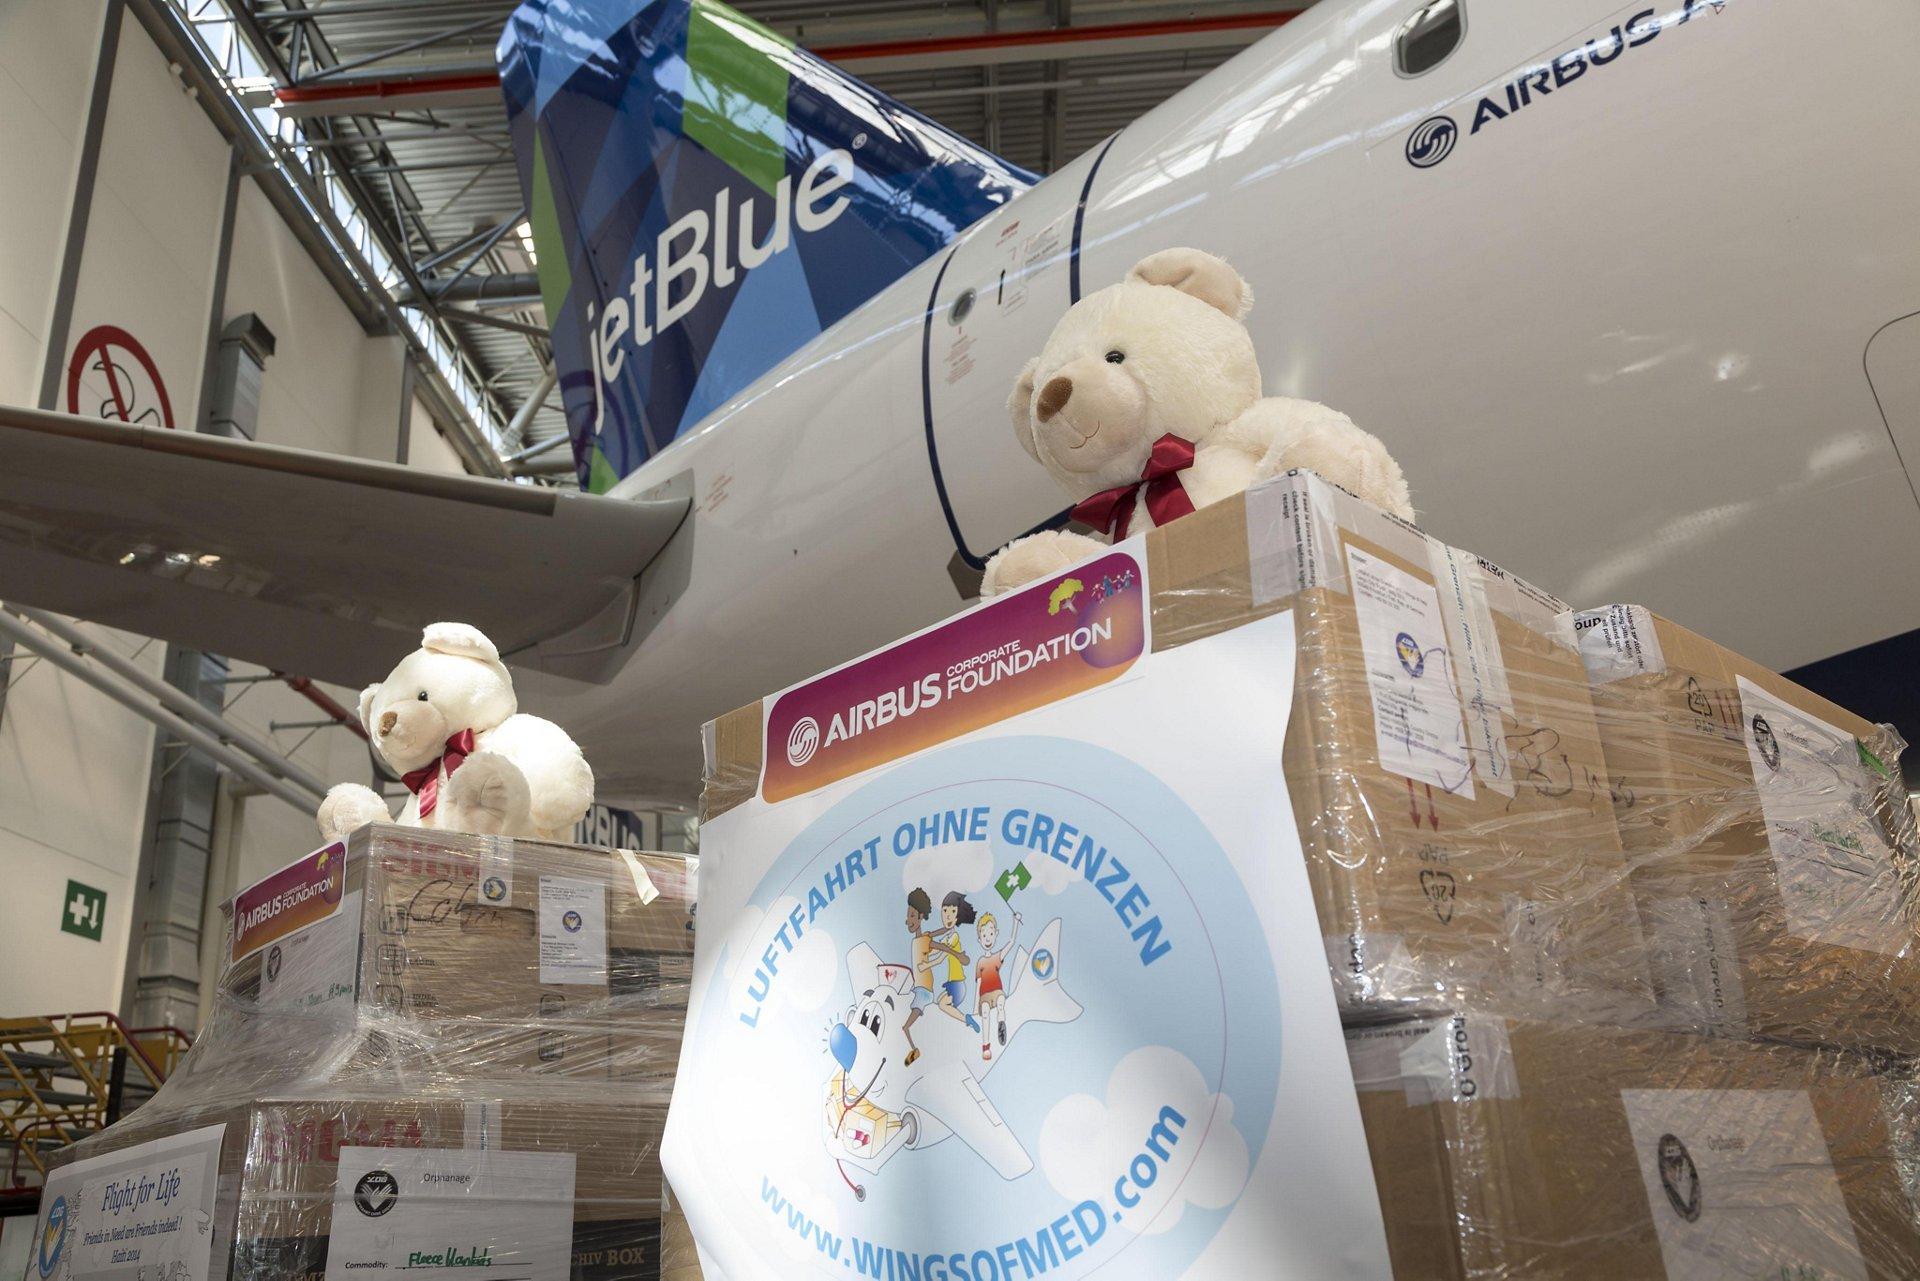 Airbus Corporate Foundation, JetBlue and Luftfahrt ohne Grenzen – Haiti aid 2